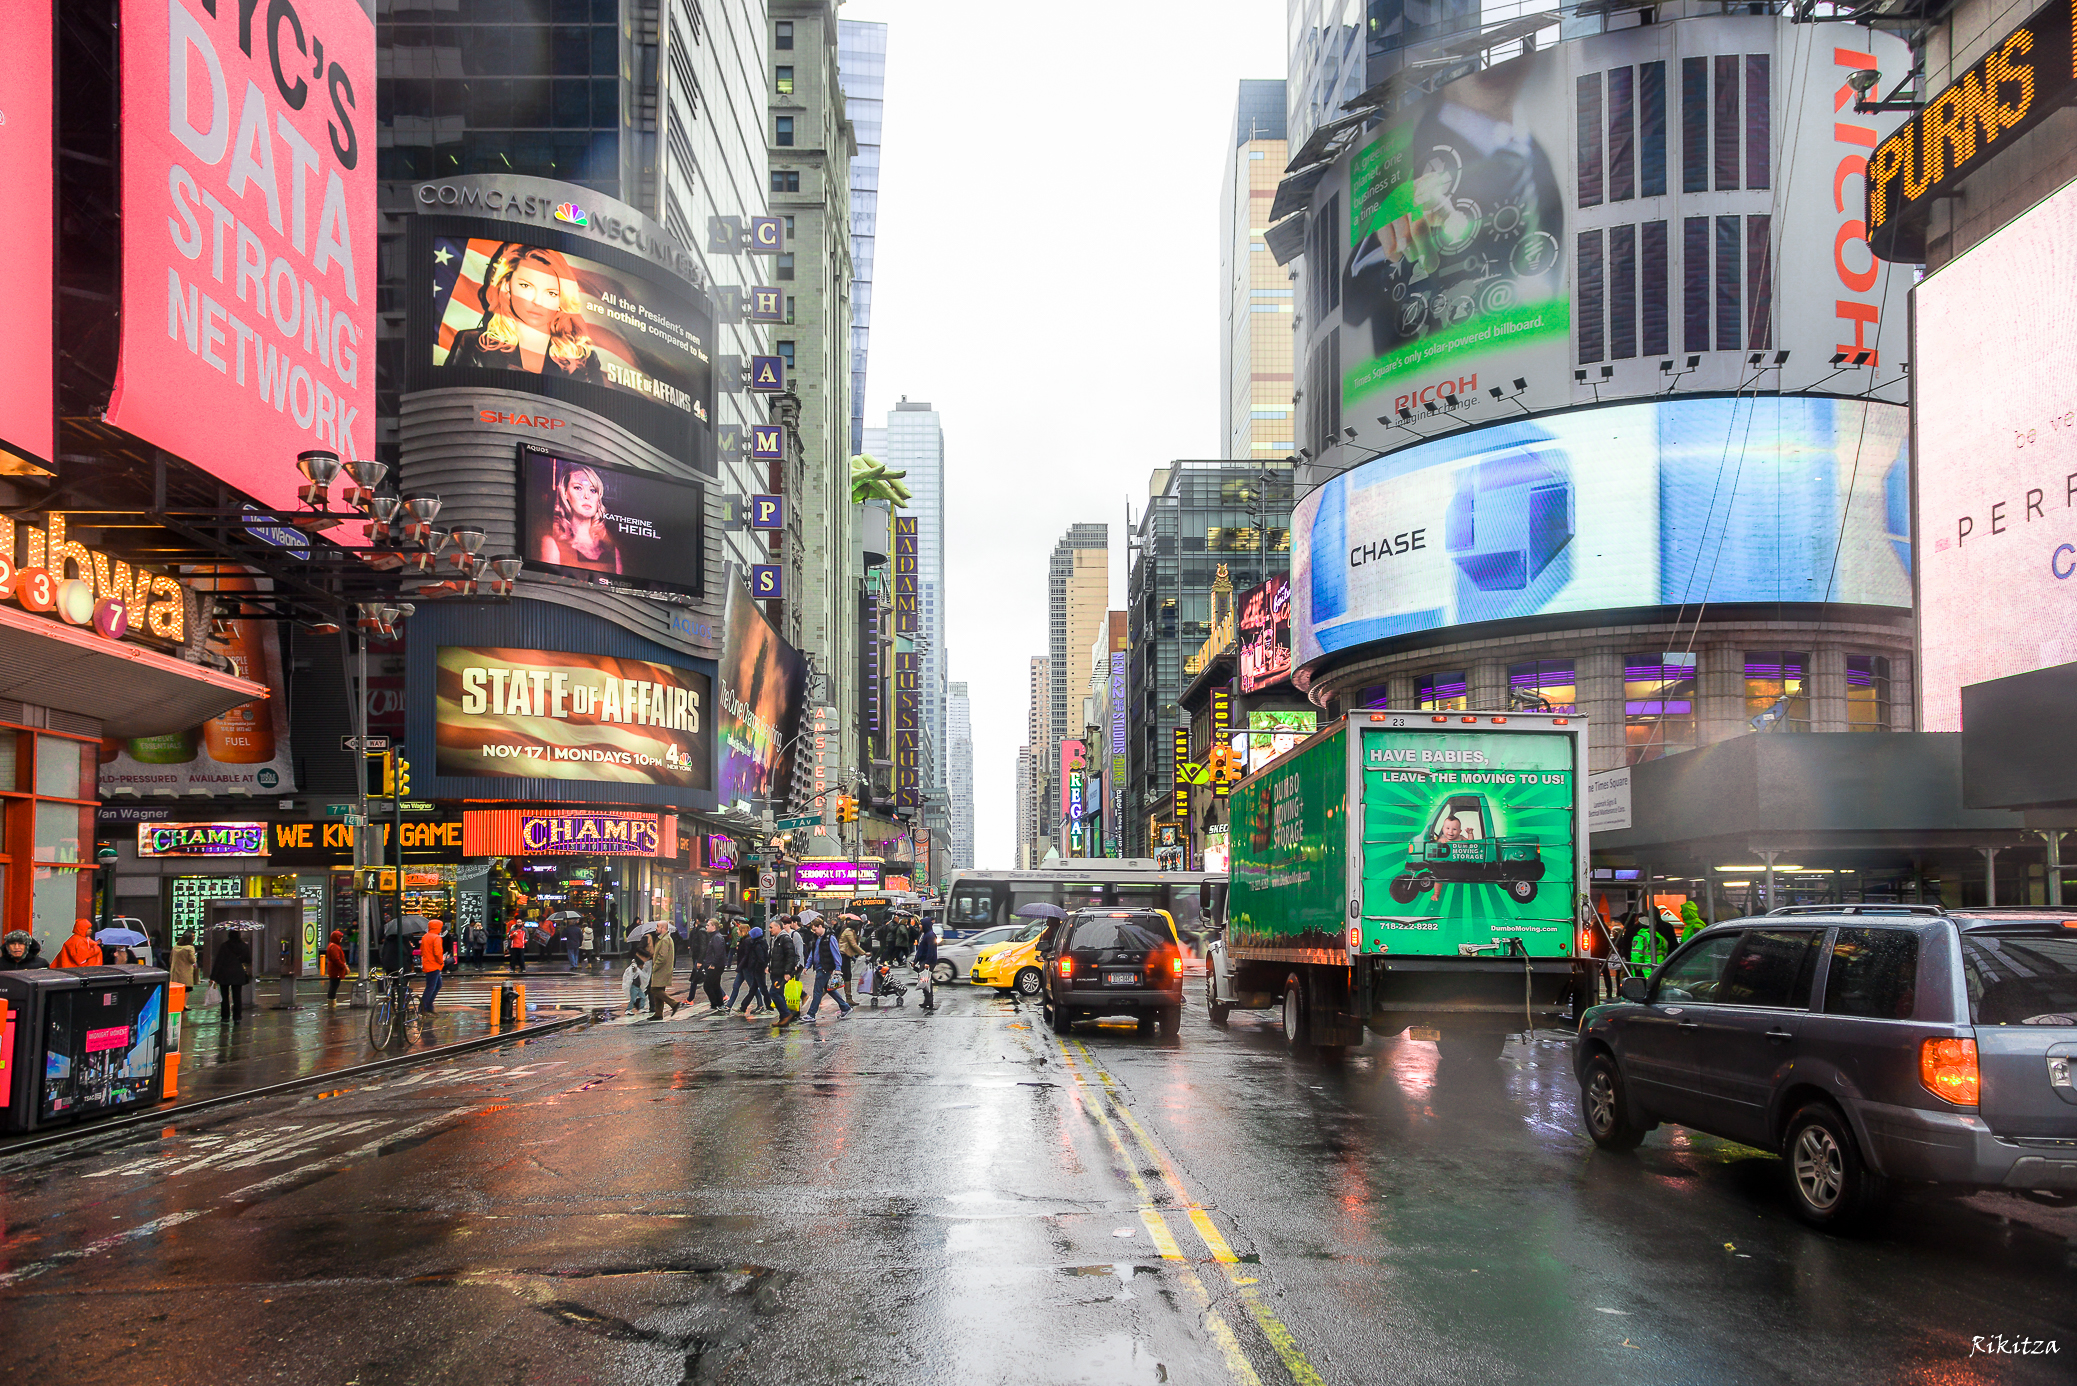 murky sky in NYC by Rikitza